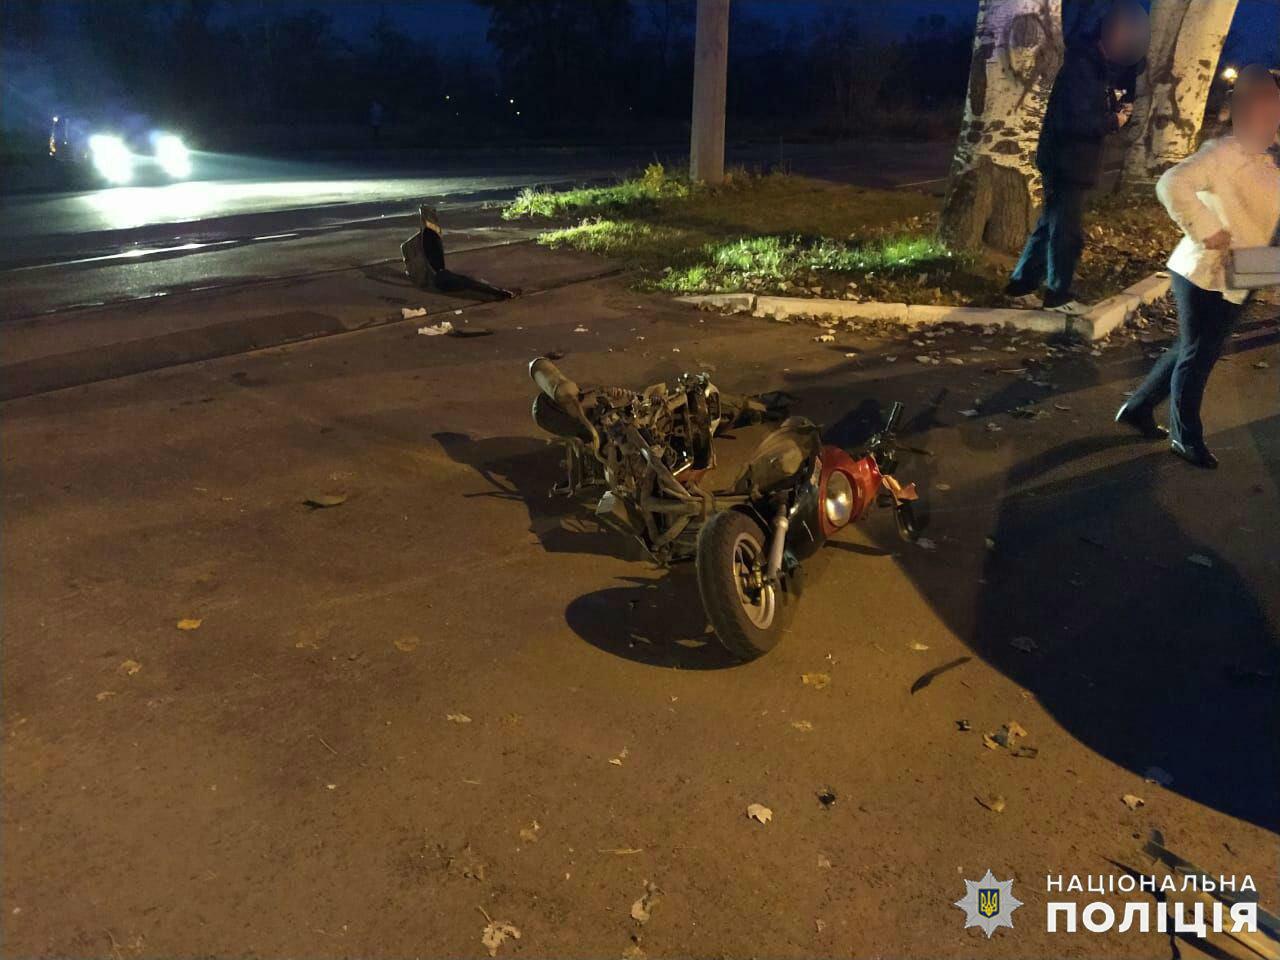 Дружковка: Вчера вечером женщина на скутере пострадала от столкновения с легковушкой (ФОТО), фото-2